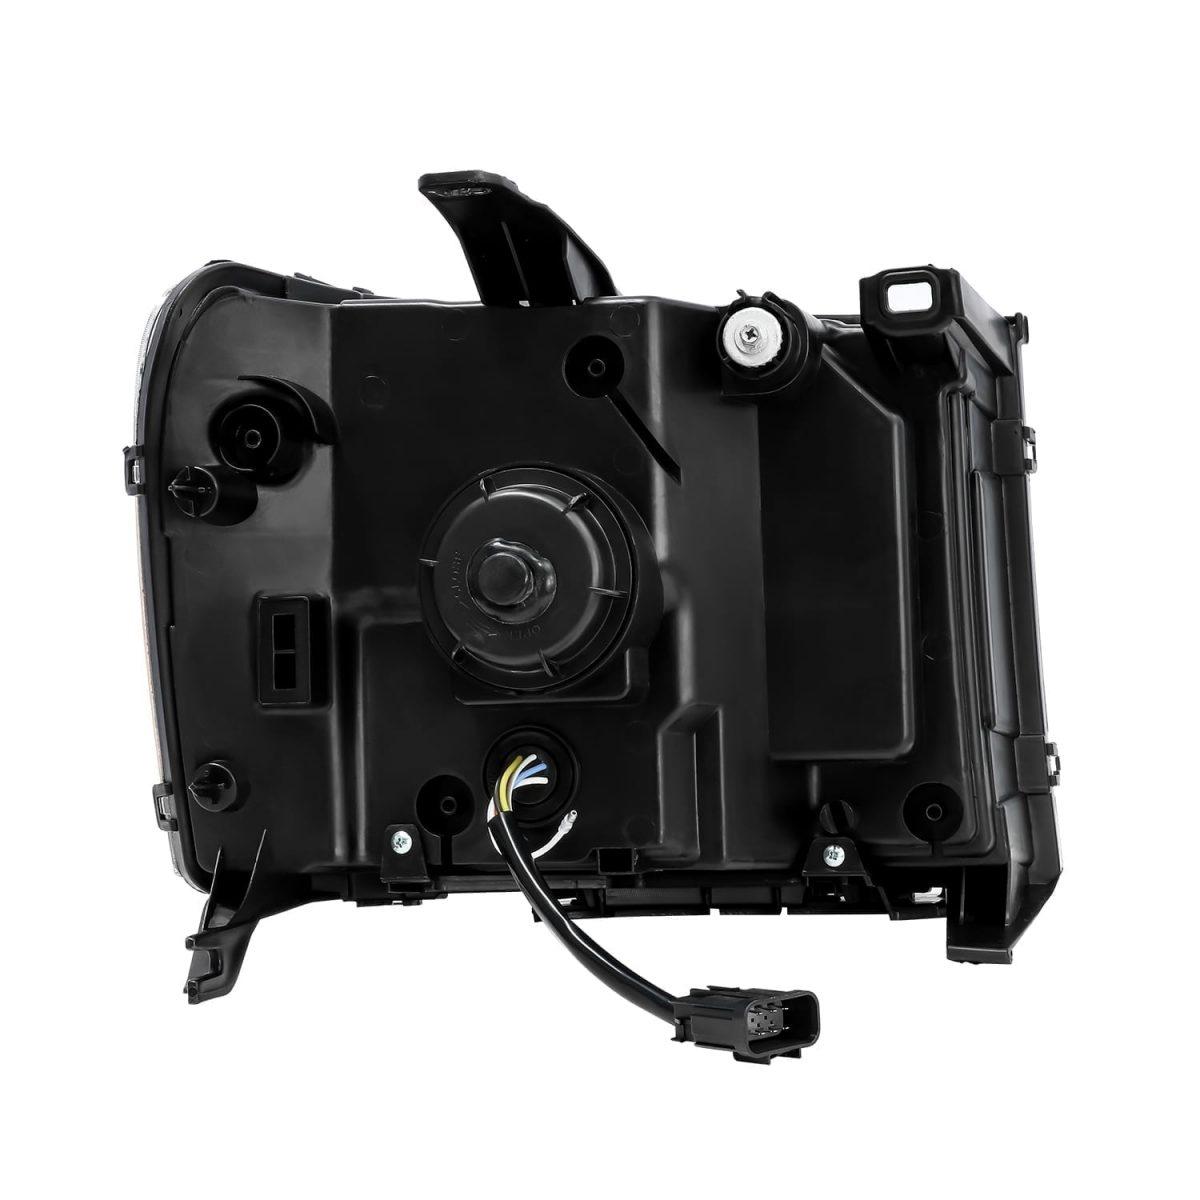 2007 2008 2009 2010 2011 2012 2013 GMC Sierra NOVA-Series Projector Headlights Back